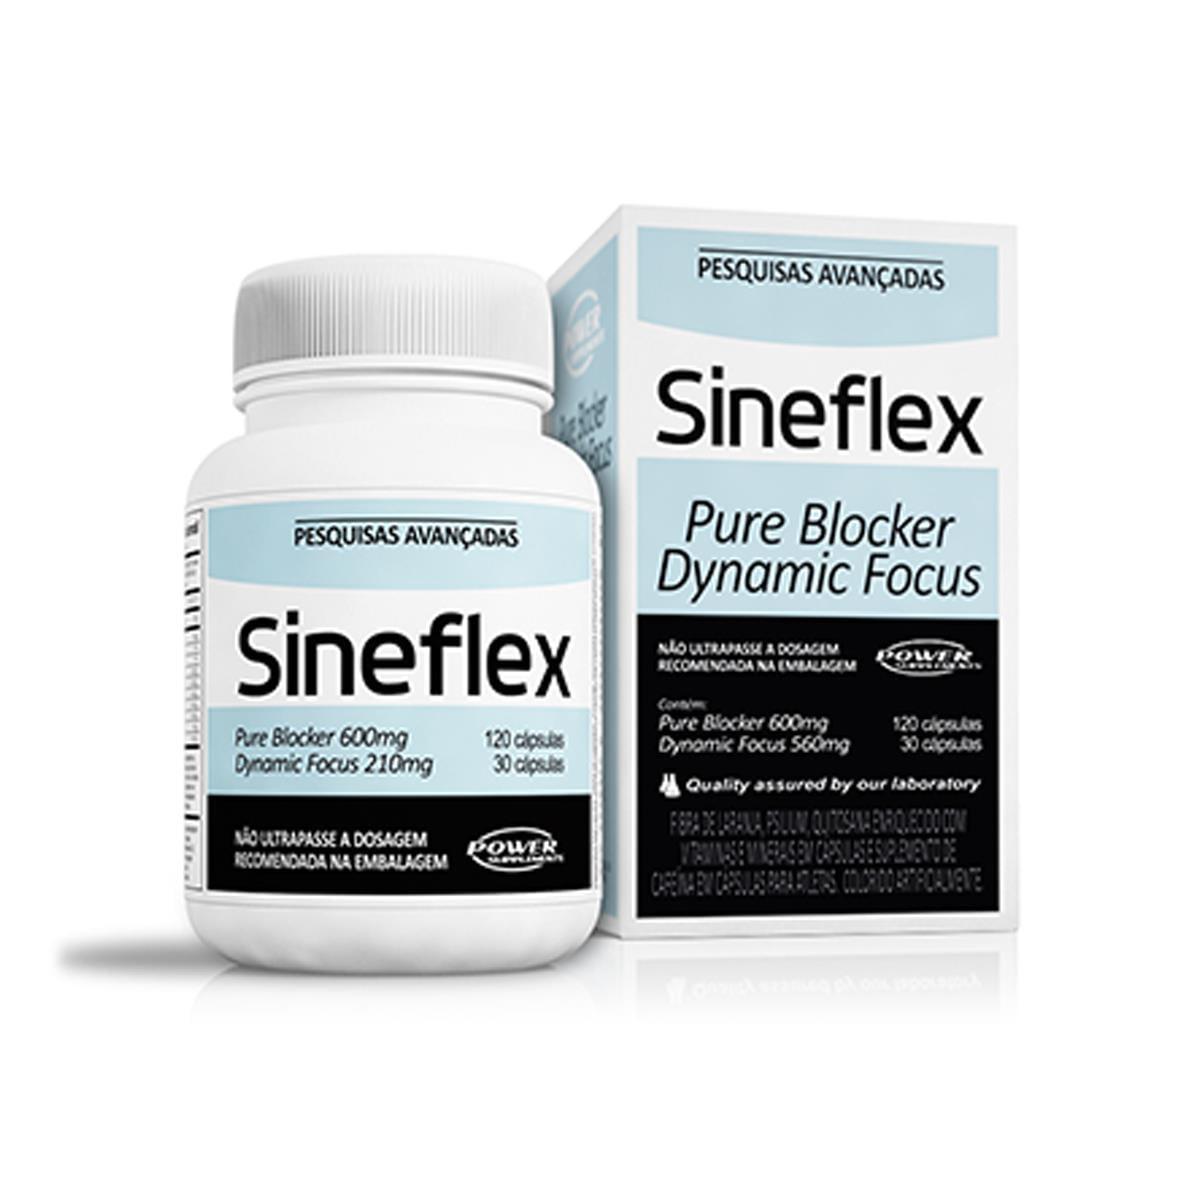 Sineflex 150 capsulas Cafeina e Diurético Power Supplements